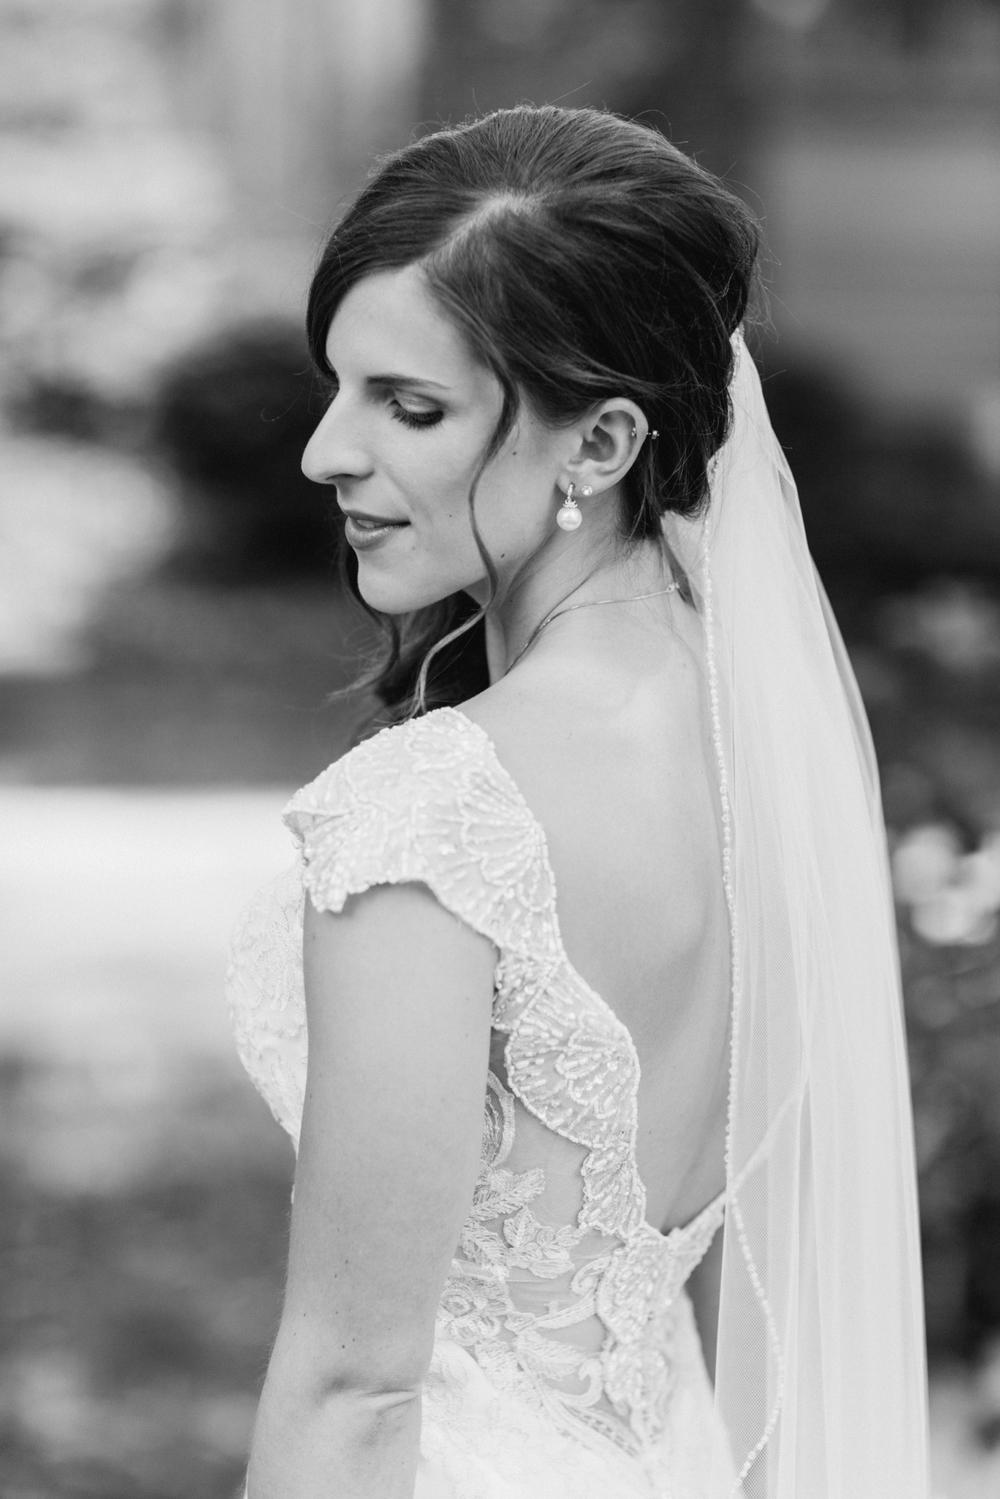 NCR_Country_Club_Kettering_Ohio_Wedding_Photography_Chloe_Luka_Photography_7072.jpg